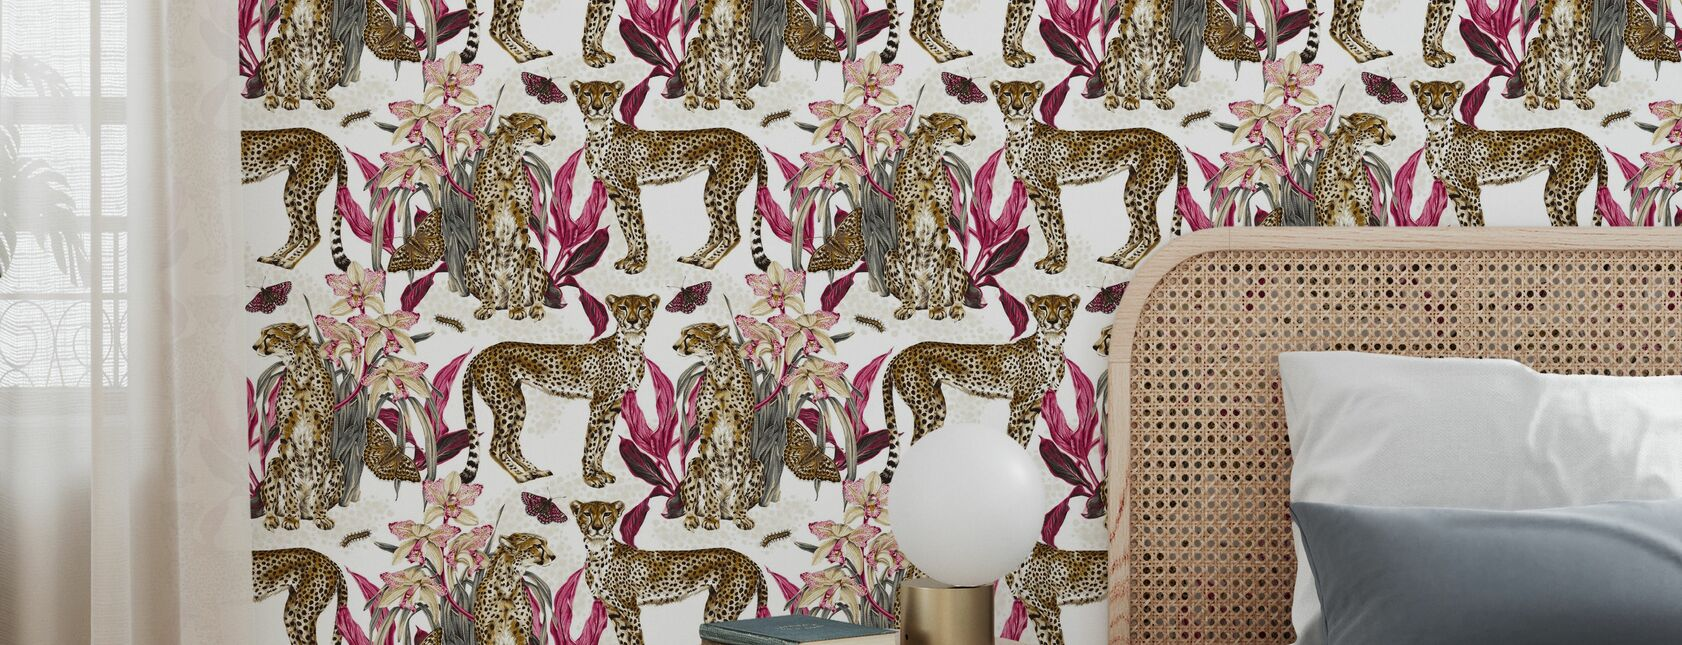 Cheetah Reveries - Cognac and Fuschia - Wallpaper - Bedroom